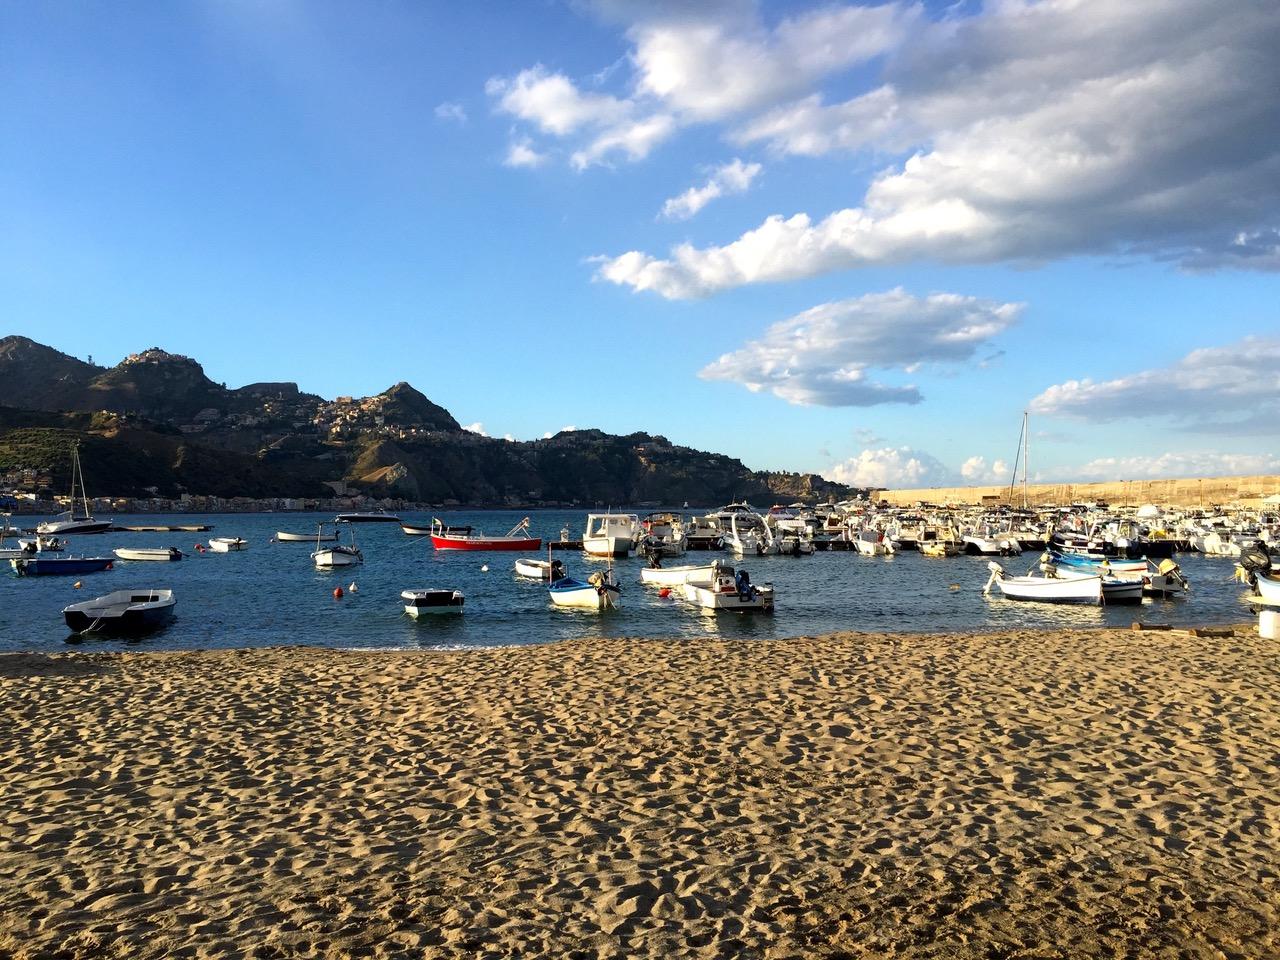 Fishing boats at Giardini Naxos, Sicily